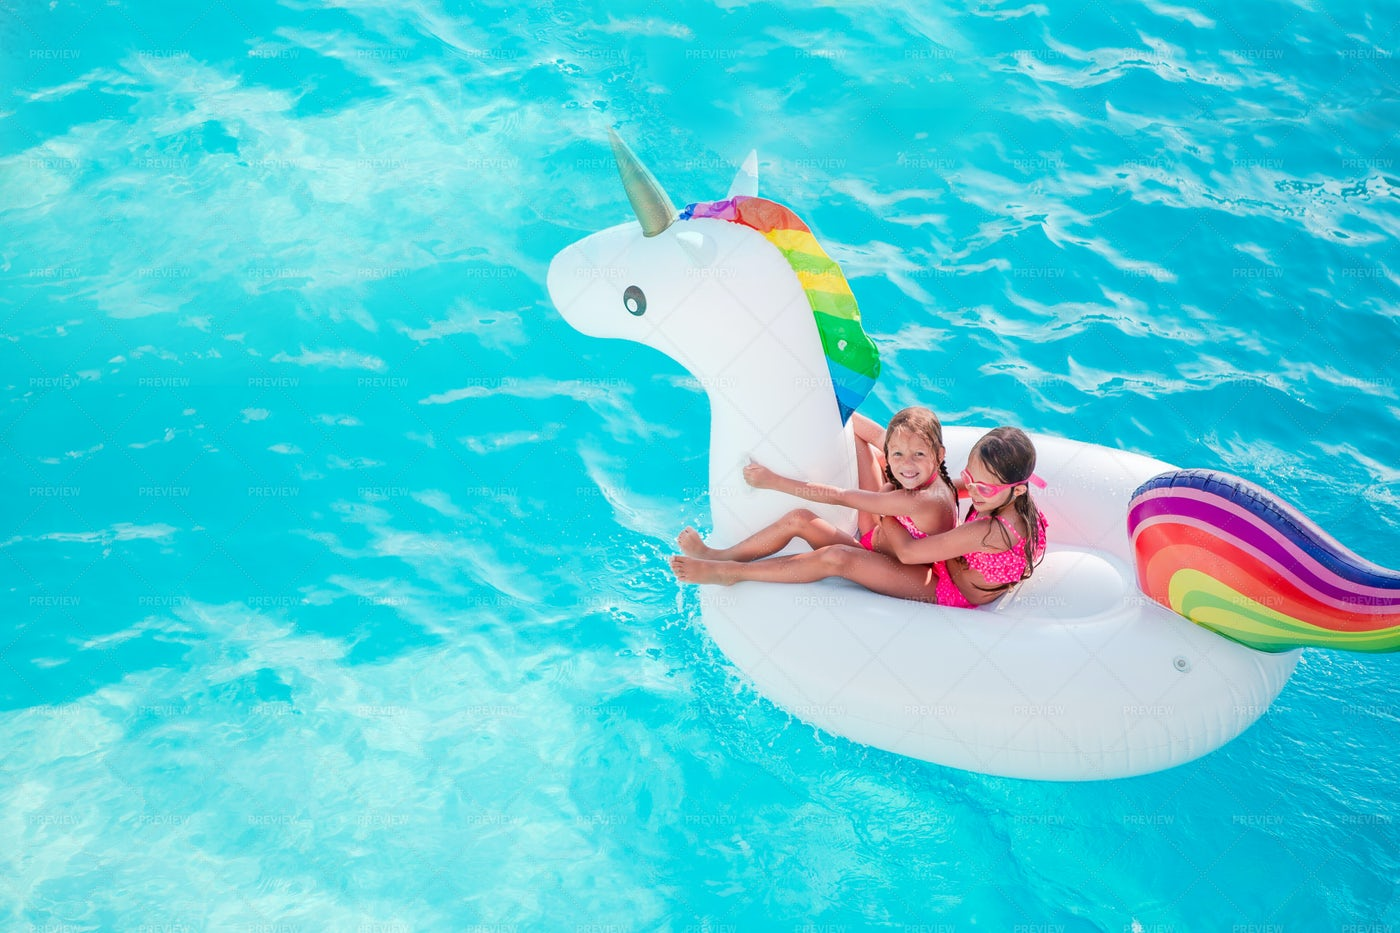 Kids On Unicorn Pool Float: Stock Photos